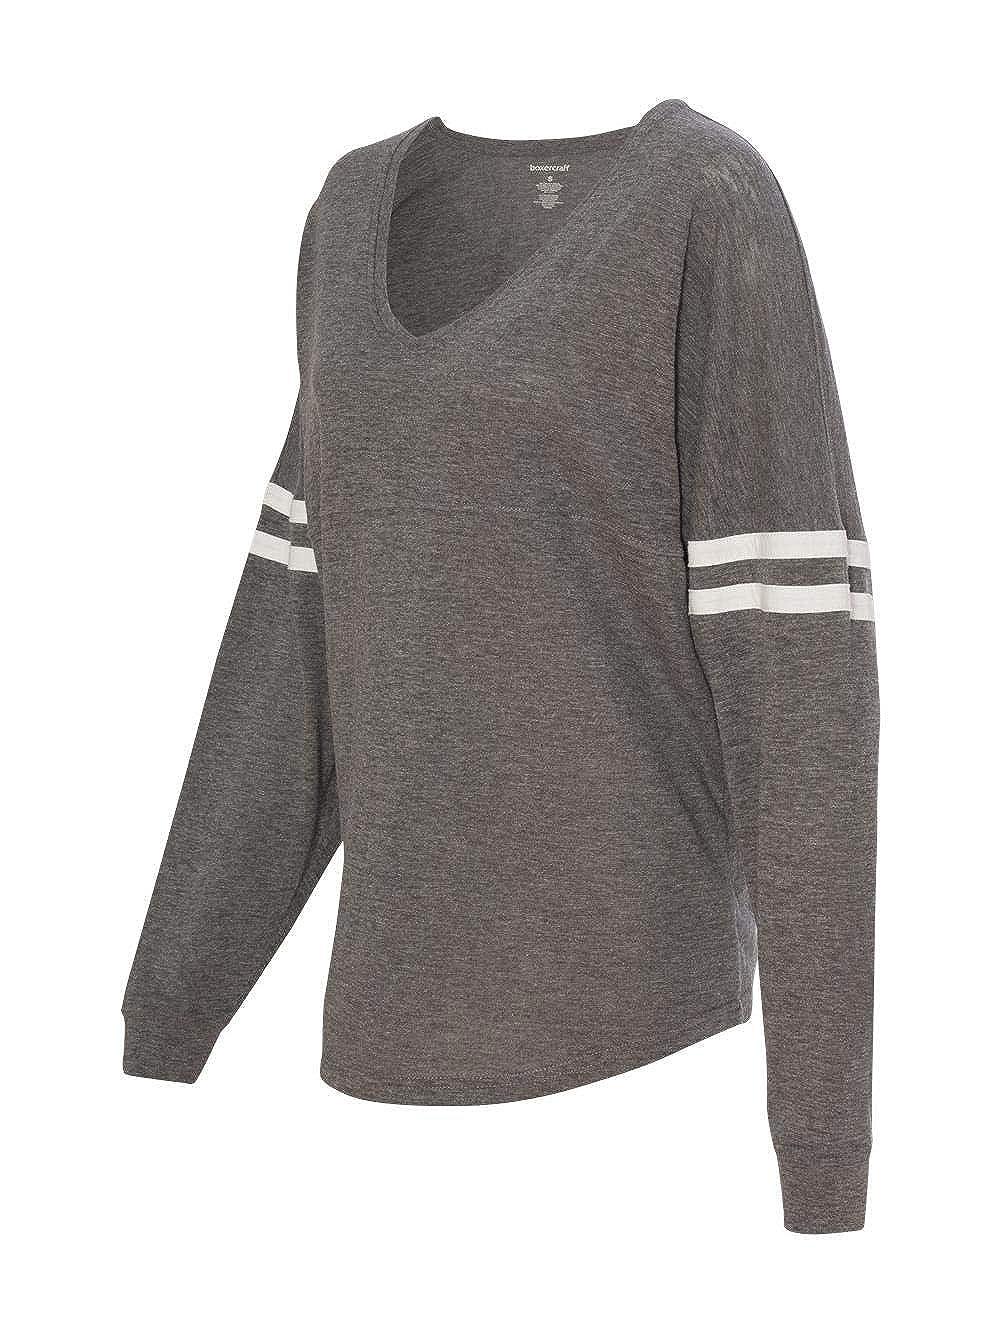 e15ff00a7 Amazon.com: Boxercraft Varsitee Slub T-Shirt - Longsleeve, Lightweight  Jersey, Adult Sizes,Granite, Medium: Clothing